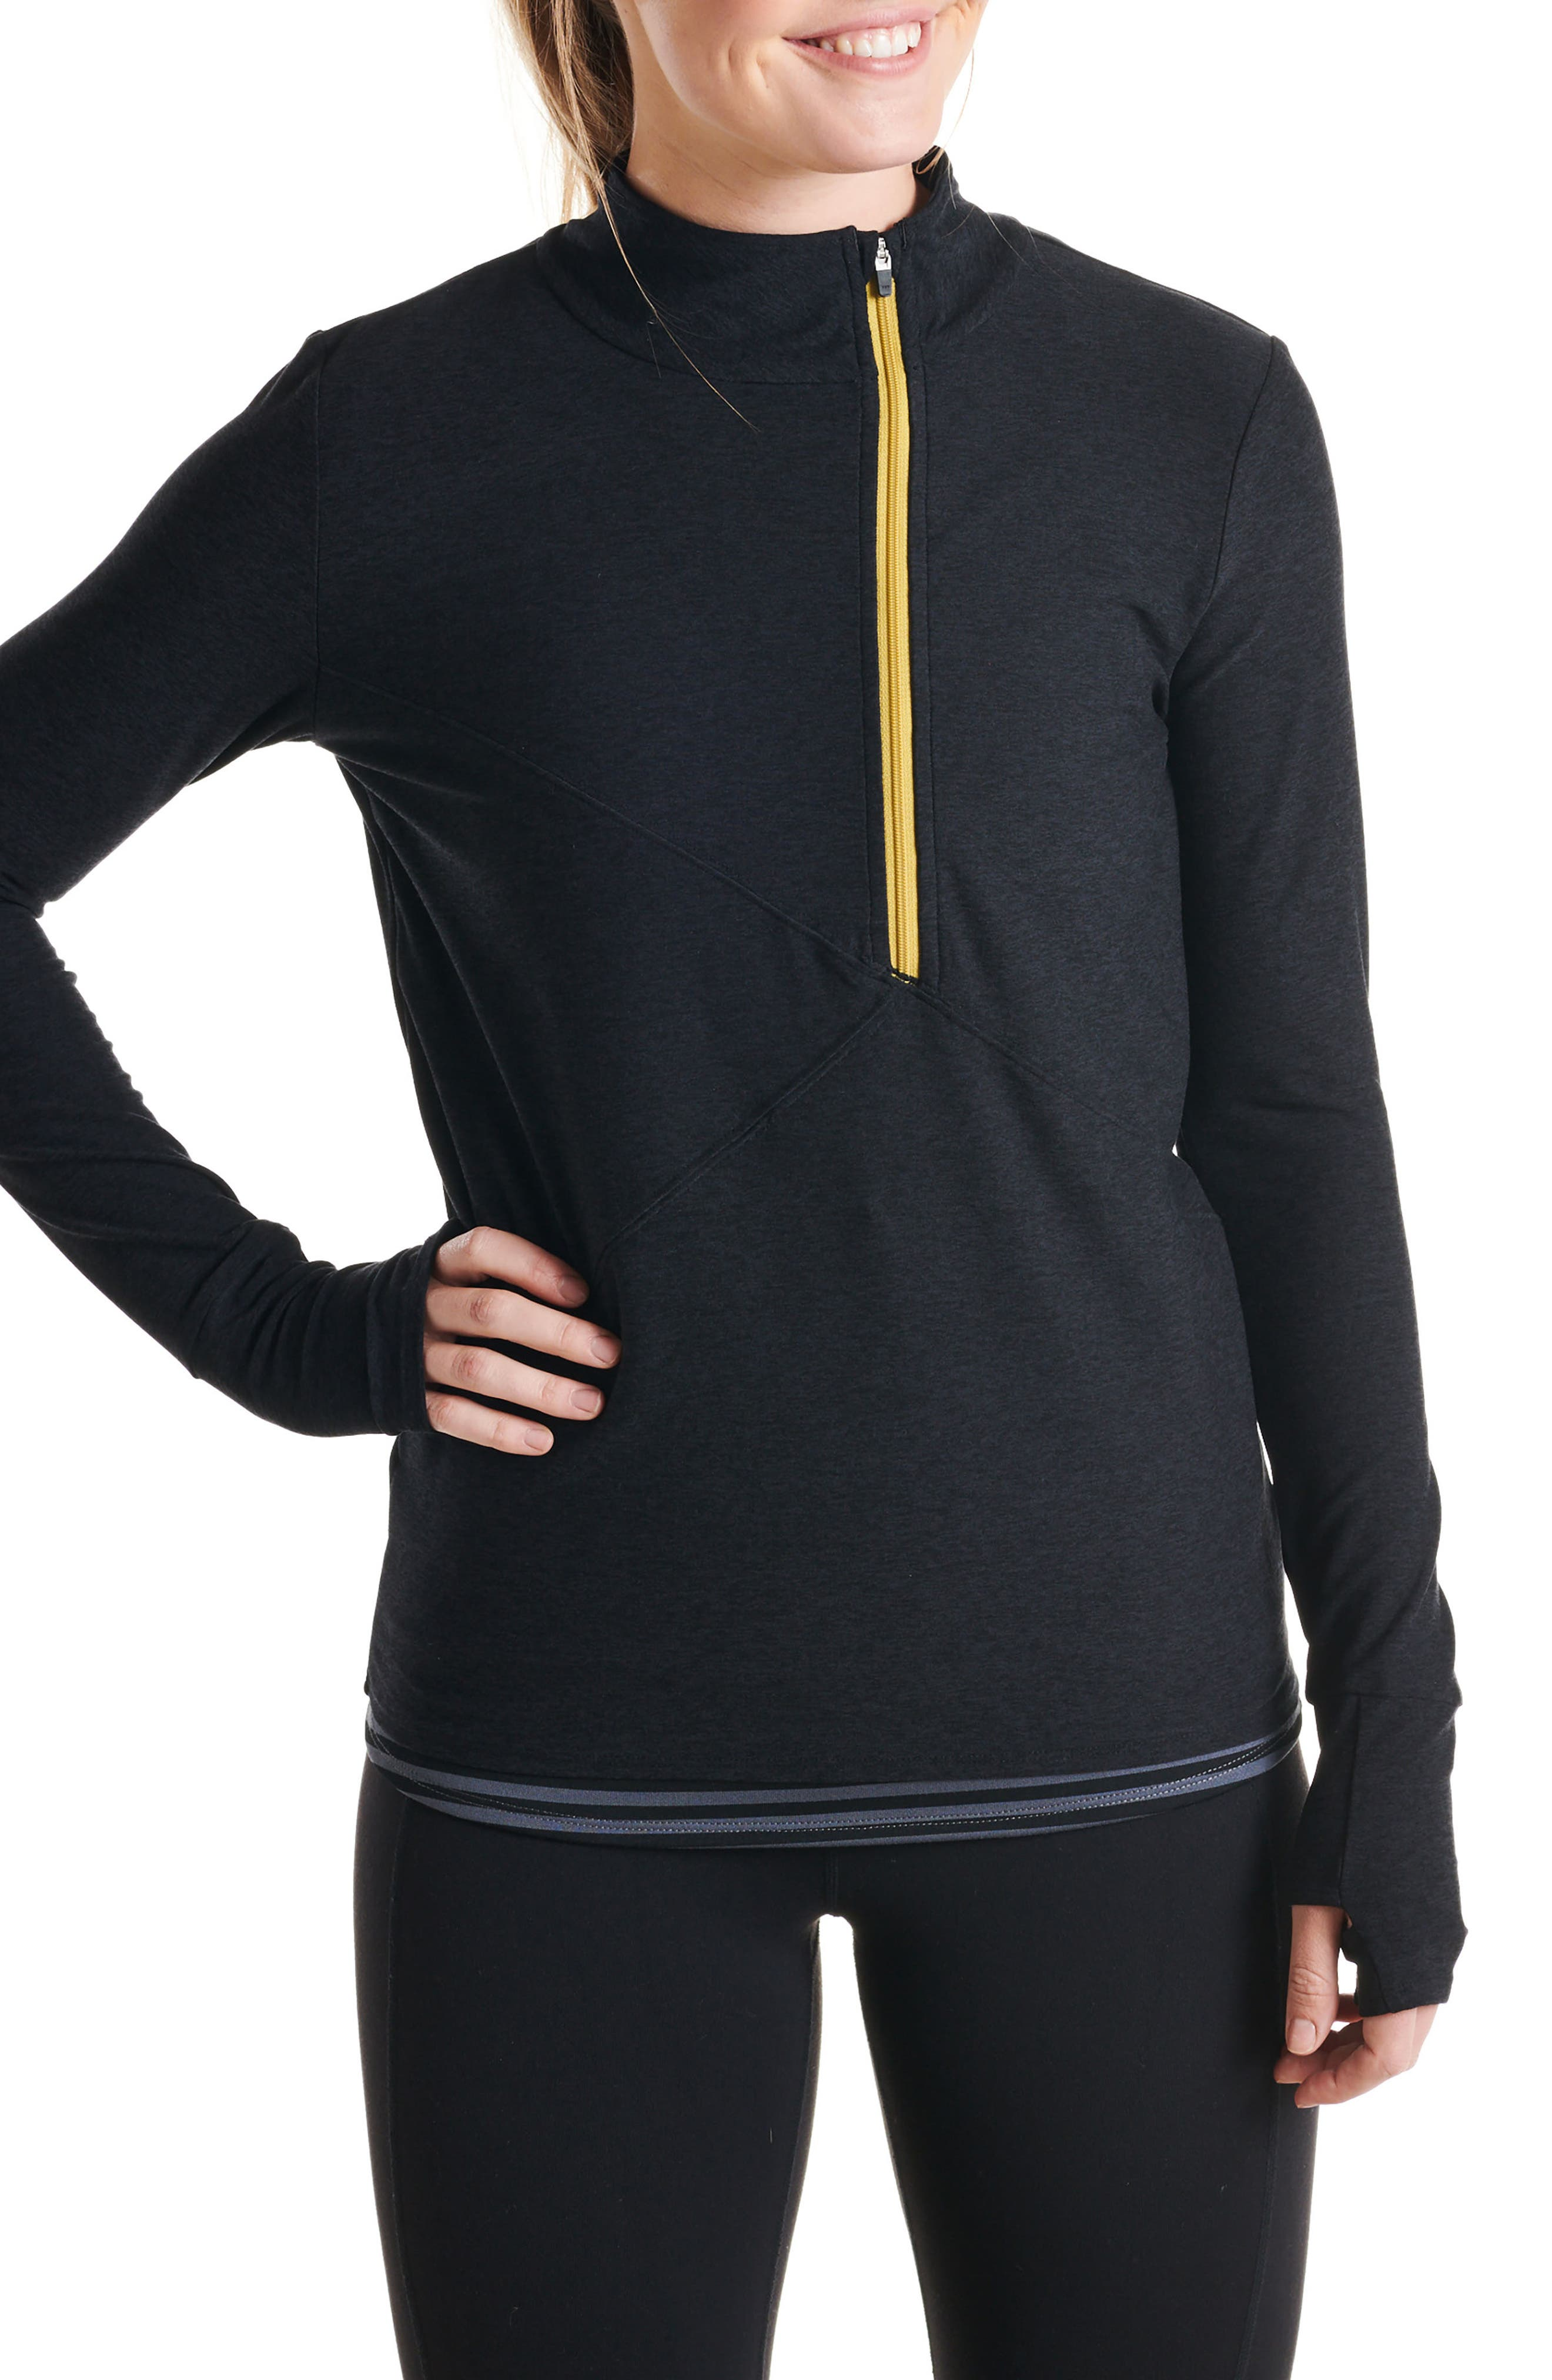 Homerun Half Zip Pullover,                         Main,                         color, BLACK/ BLACK